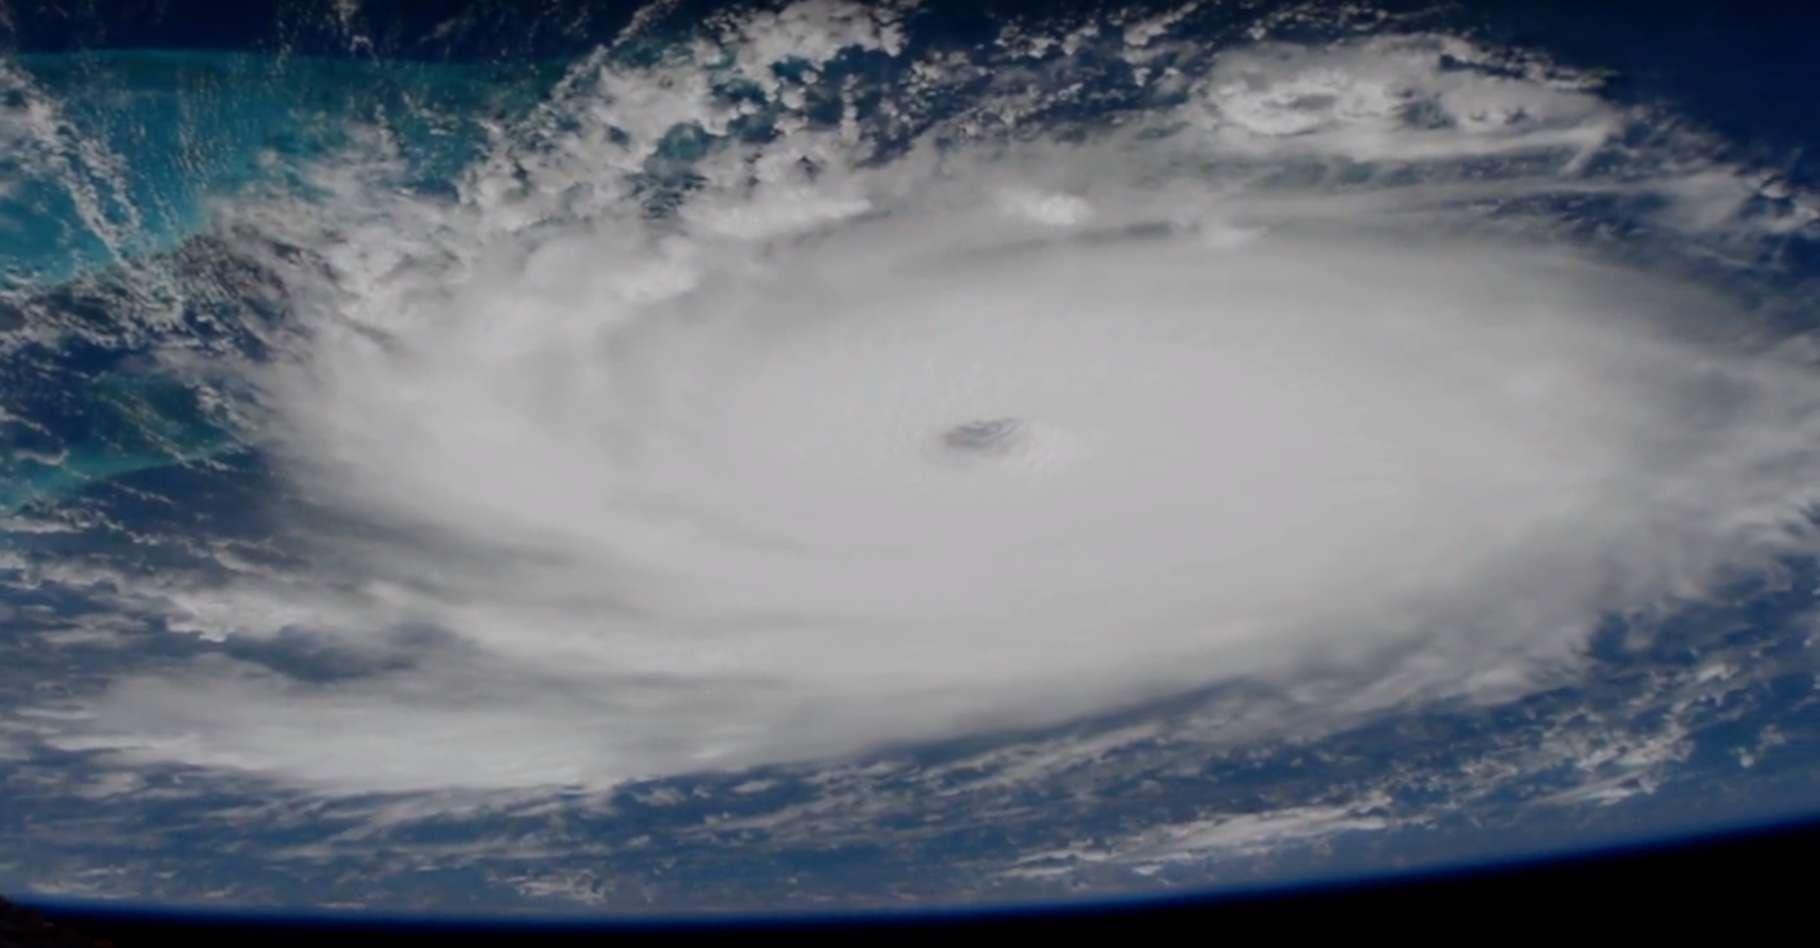 Les images de l'ouragan Dorian vu de l'espace donnent un aperçu de la puissance du phénomène. © Nasa Video, YouTube